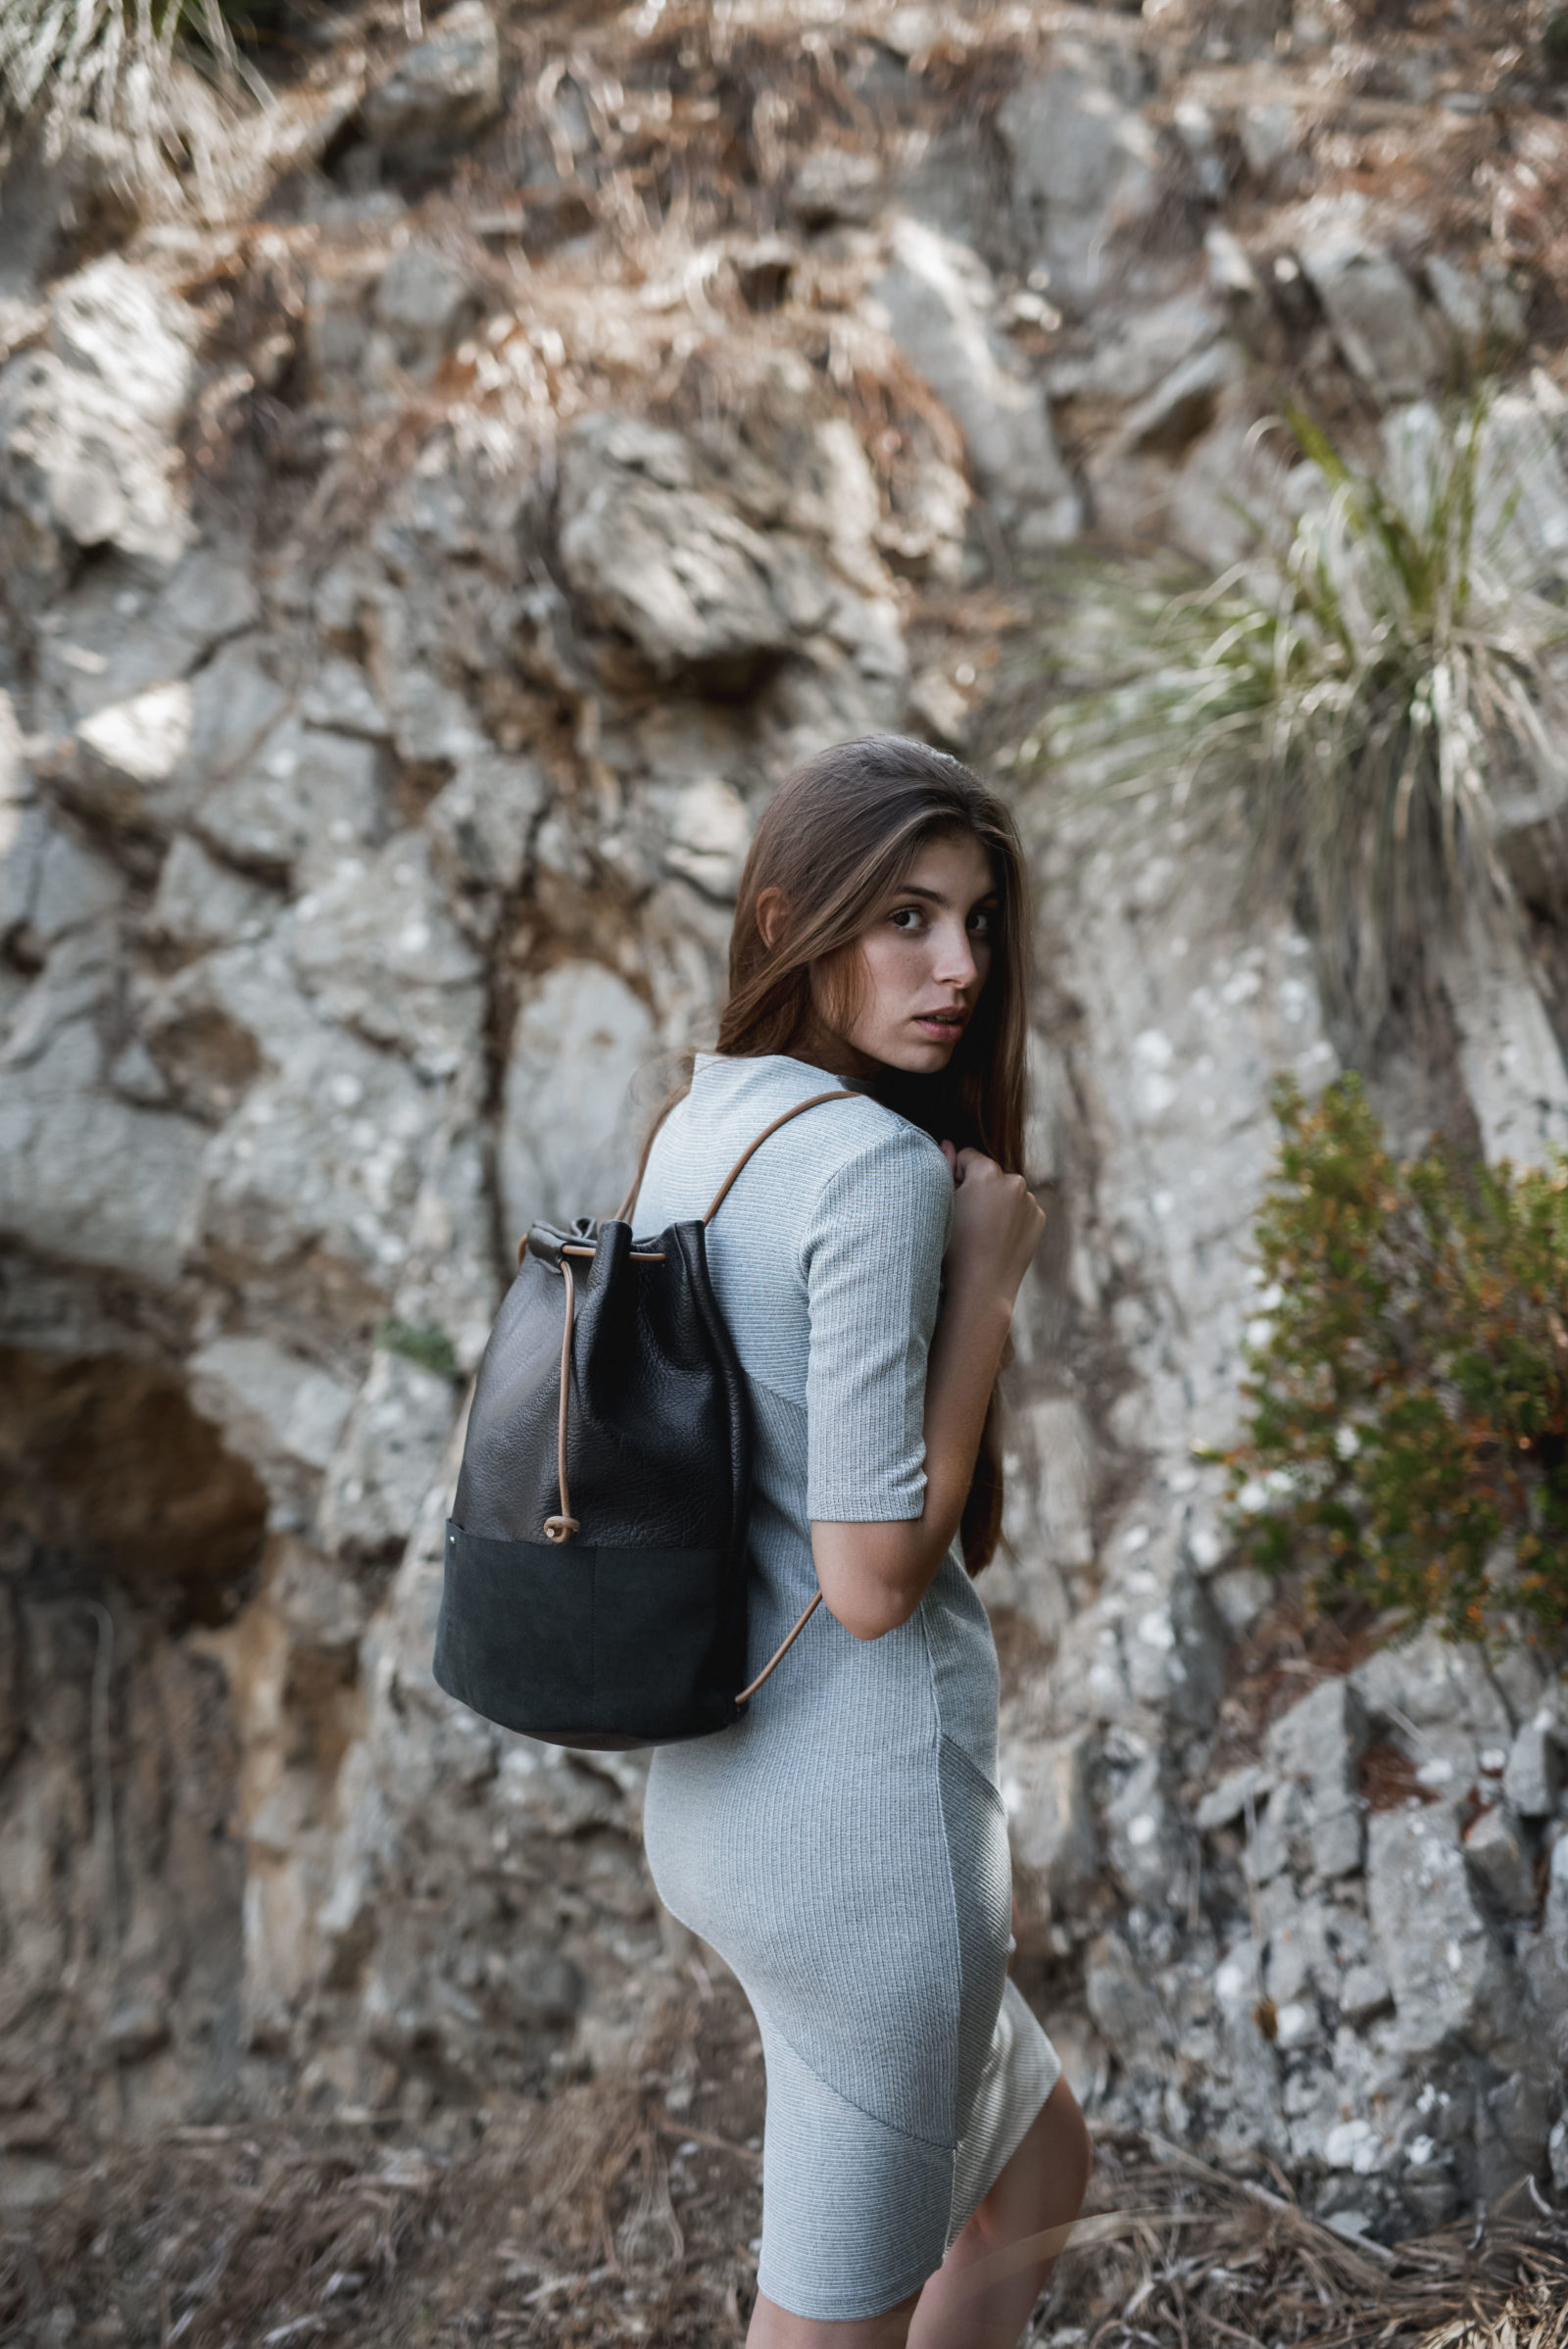 Maravillas Bags   Christina Bussmann   Palma de Mallorca   Fotos: Soravit L   GROSS∆RTIG